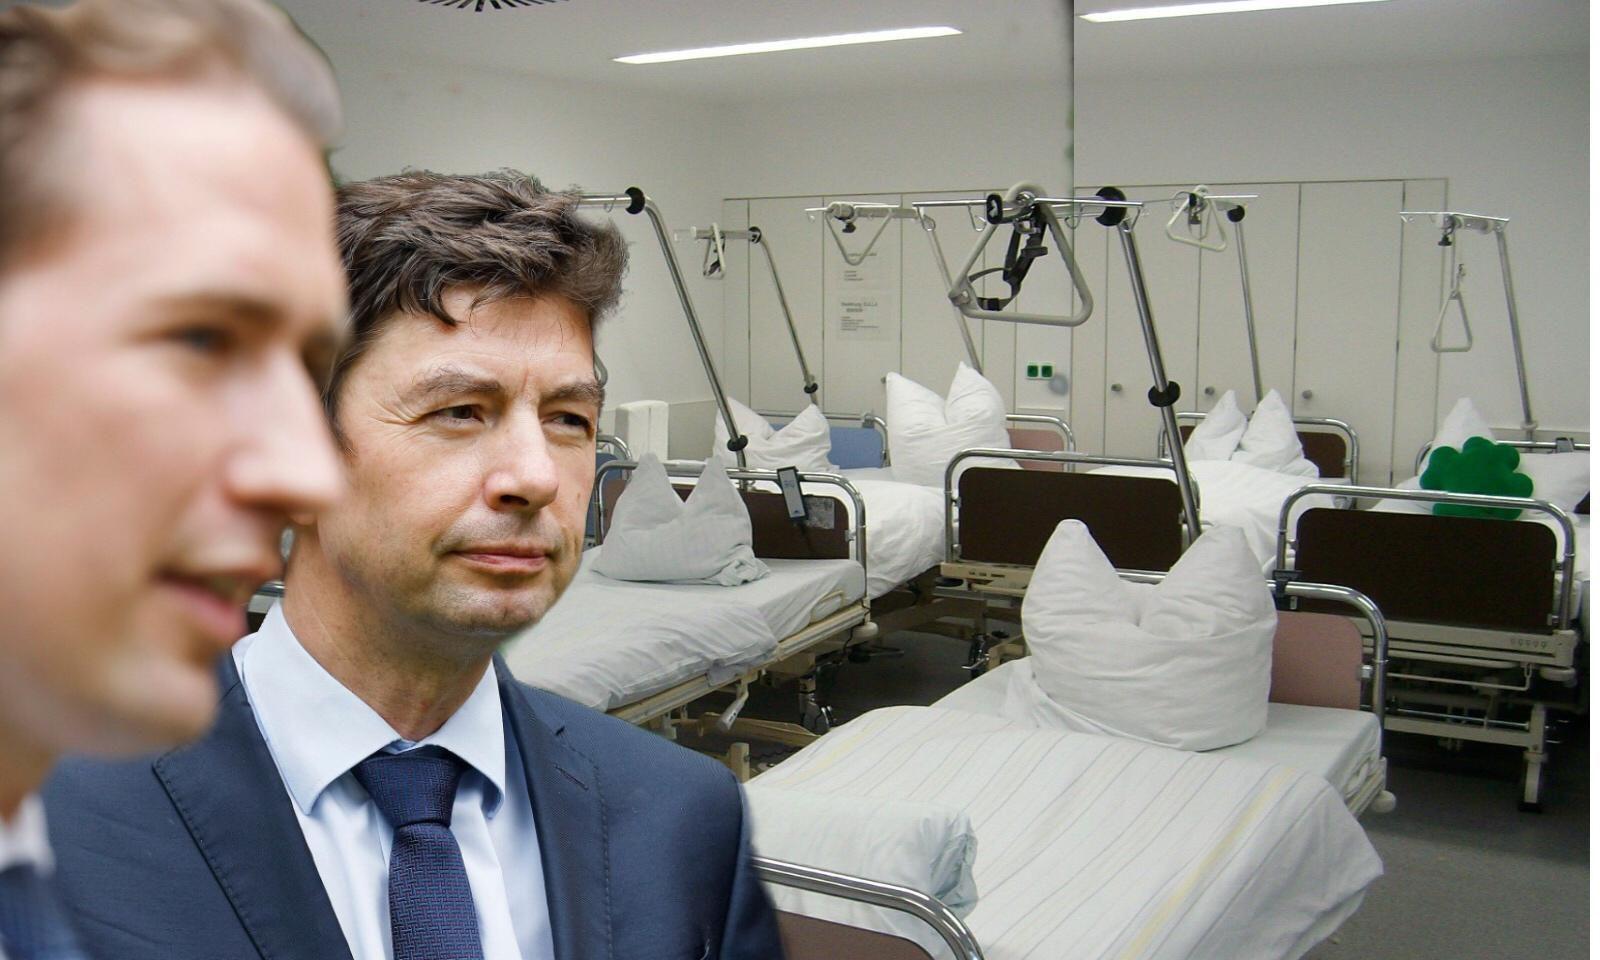 Sebastian Kurz / Christian Drosten